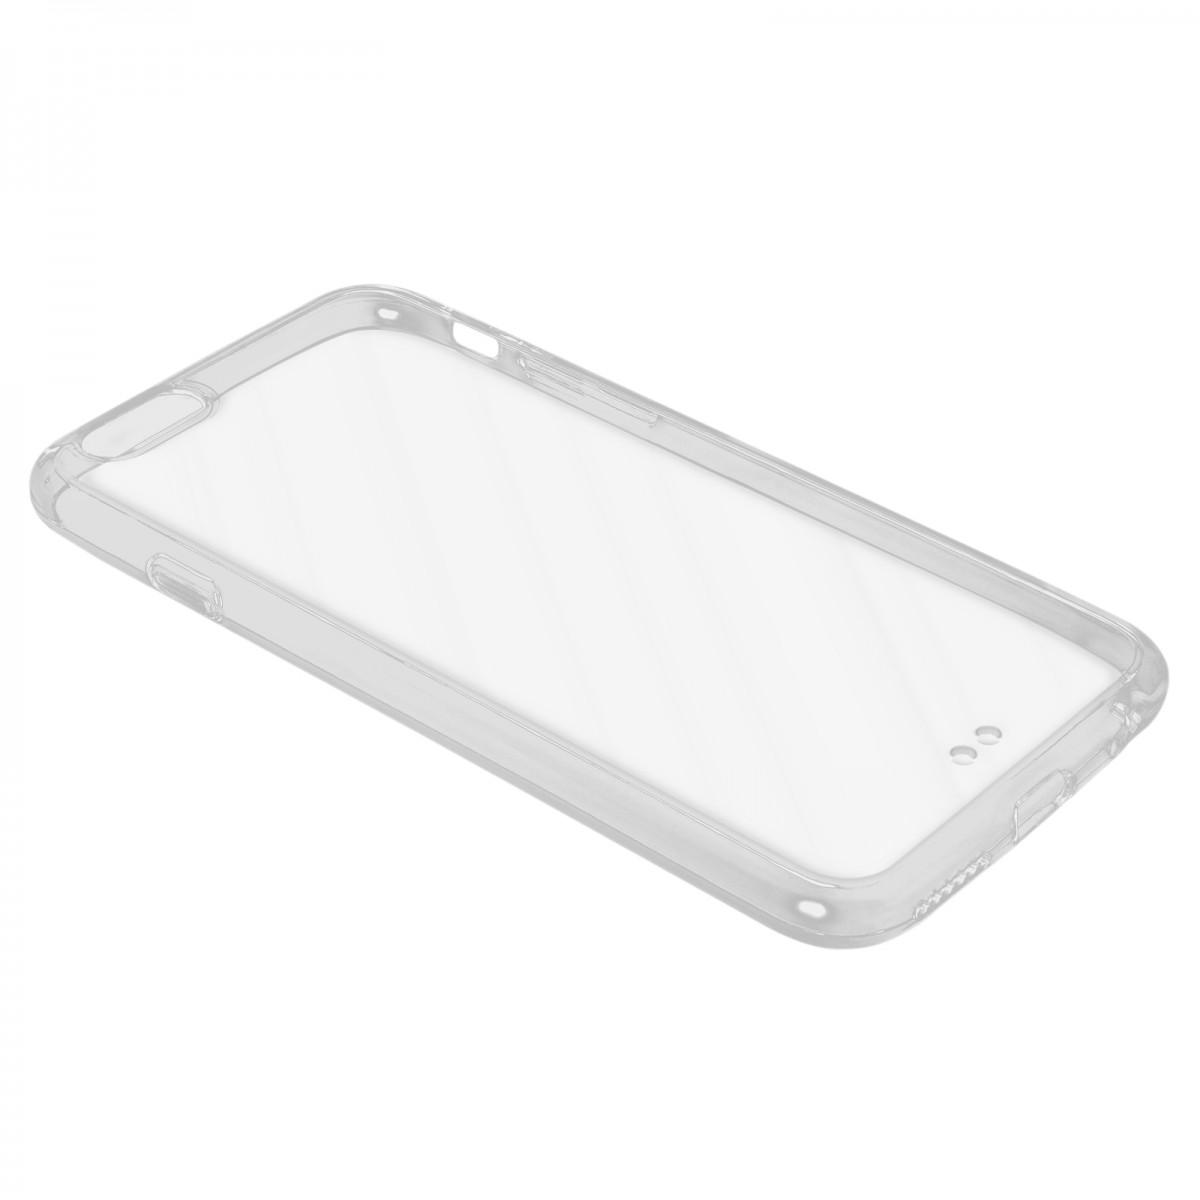 efabrik silikon cover f r apple iphone 6s schutzh lle 4 7. Black Bedroom Furniture Sets. Home Design Ideas